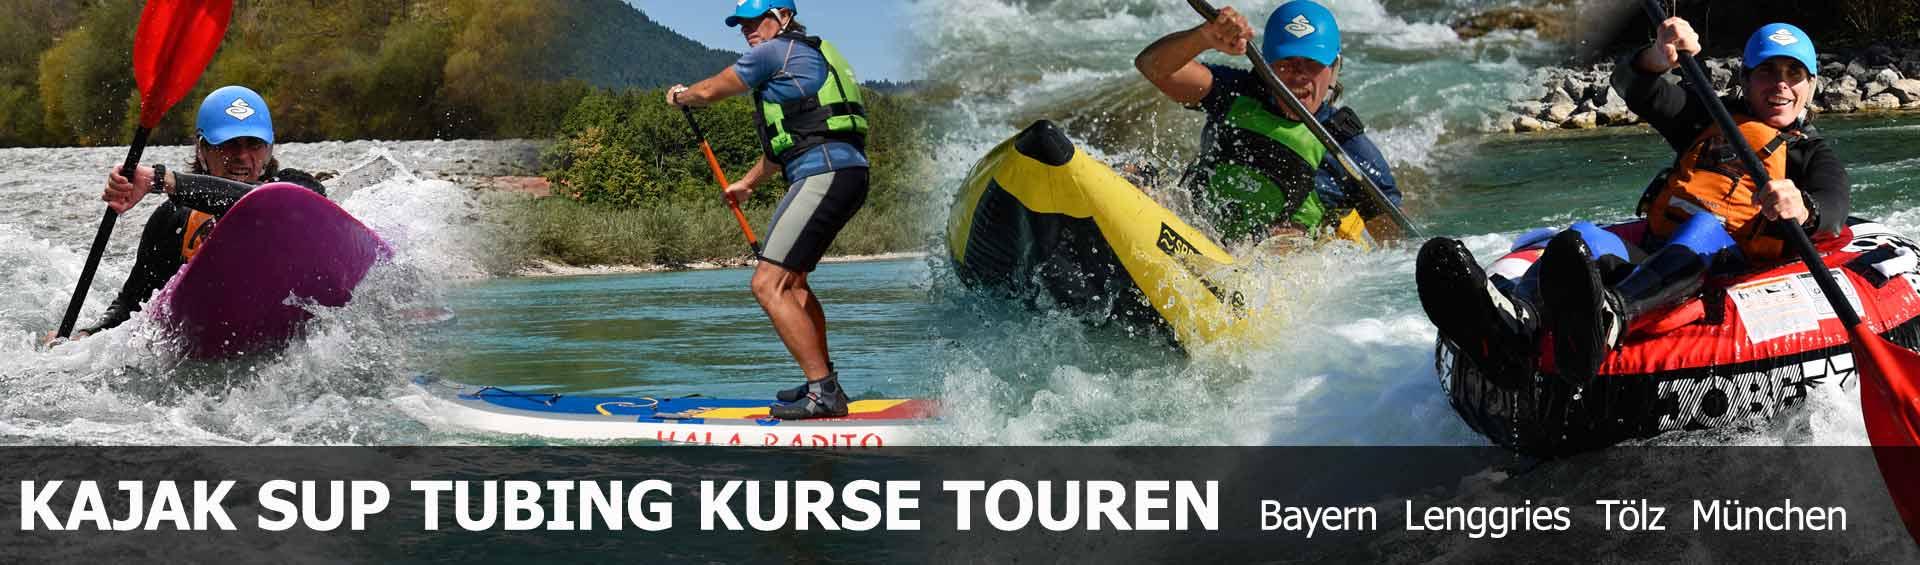 Kajak & Kanu Schule an der Isar Lenggries Raum München, Kanu, SUP - Stand up Paddling und Tubing Touren Bayern